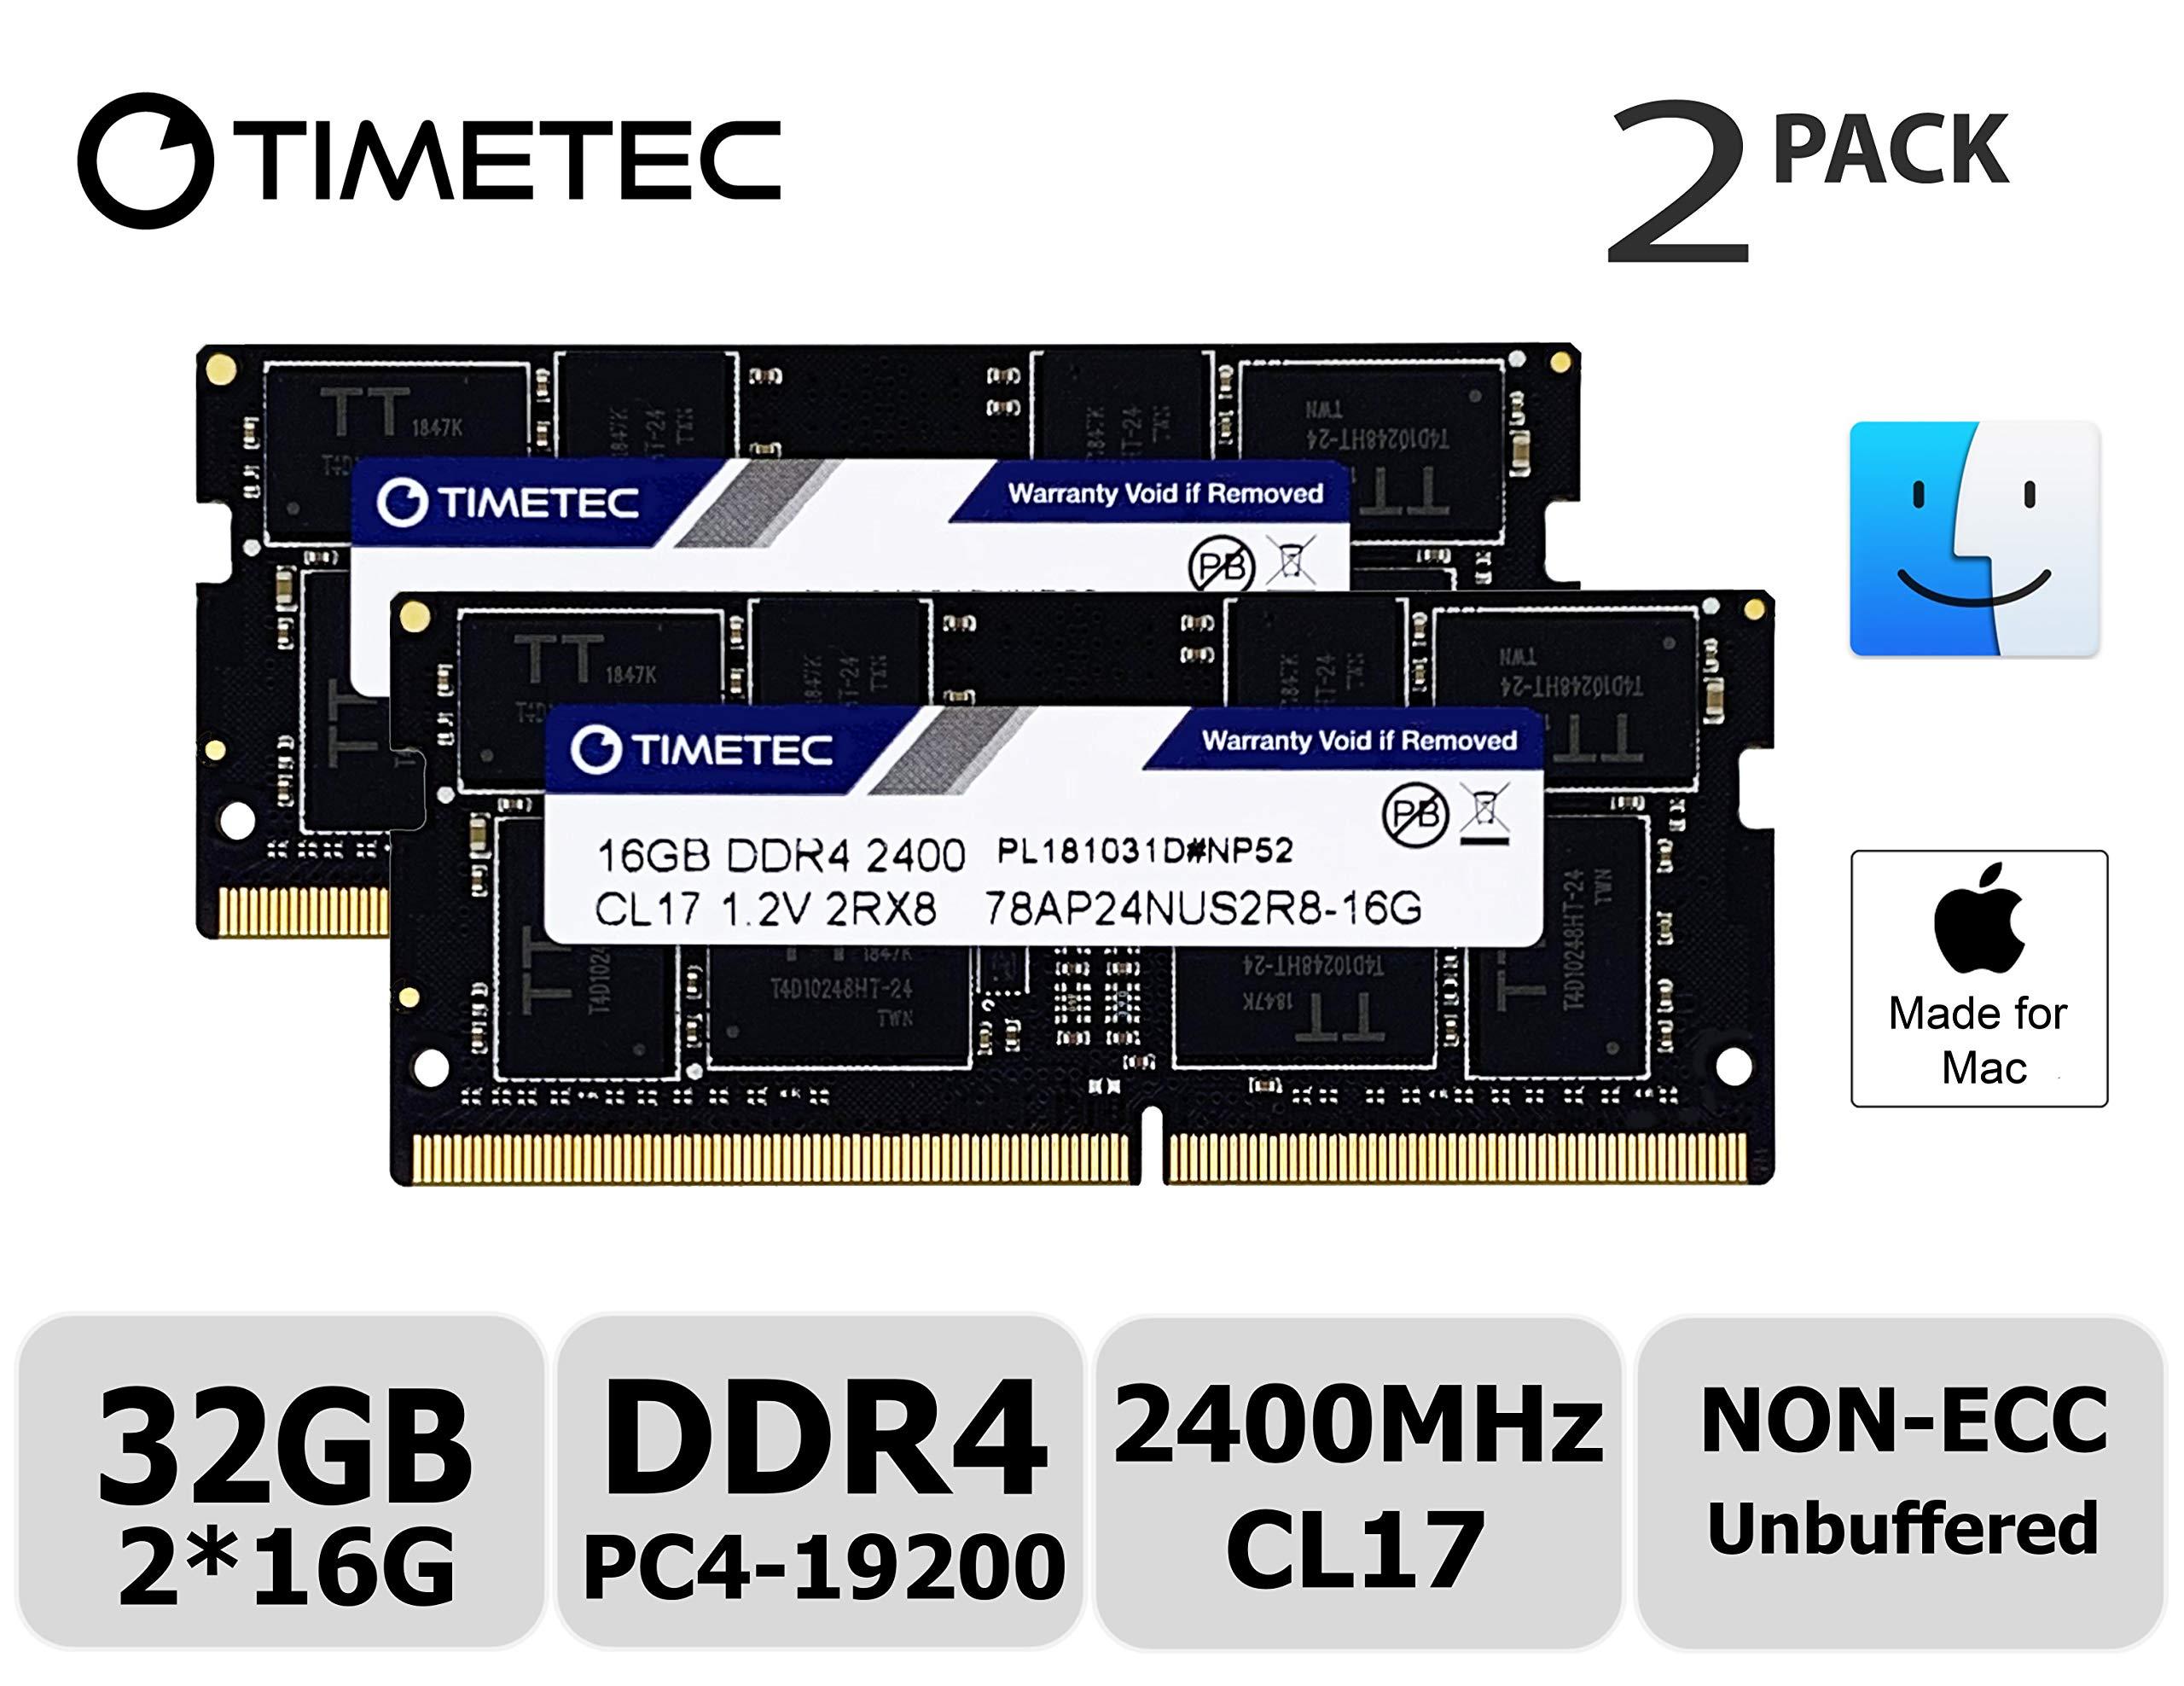 Timetec Hynix IC Apple 32GB Kit (2x16GB) DDR4 2400MHz PC4-19200 SODIMM Memory Upgrade for iMac Retina 4k/5K 21.5-inch/27-inch Mid 2017 (32GB Kit (2x16GB))